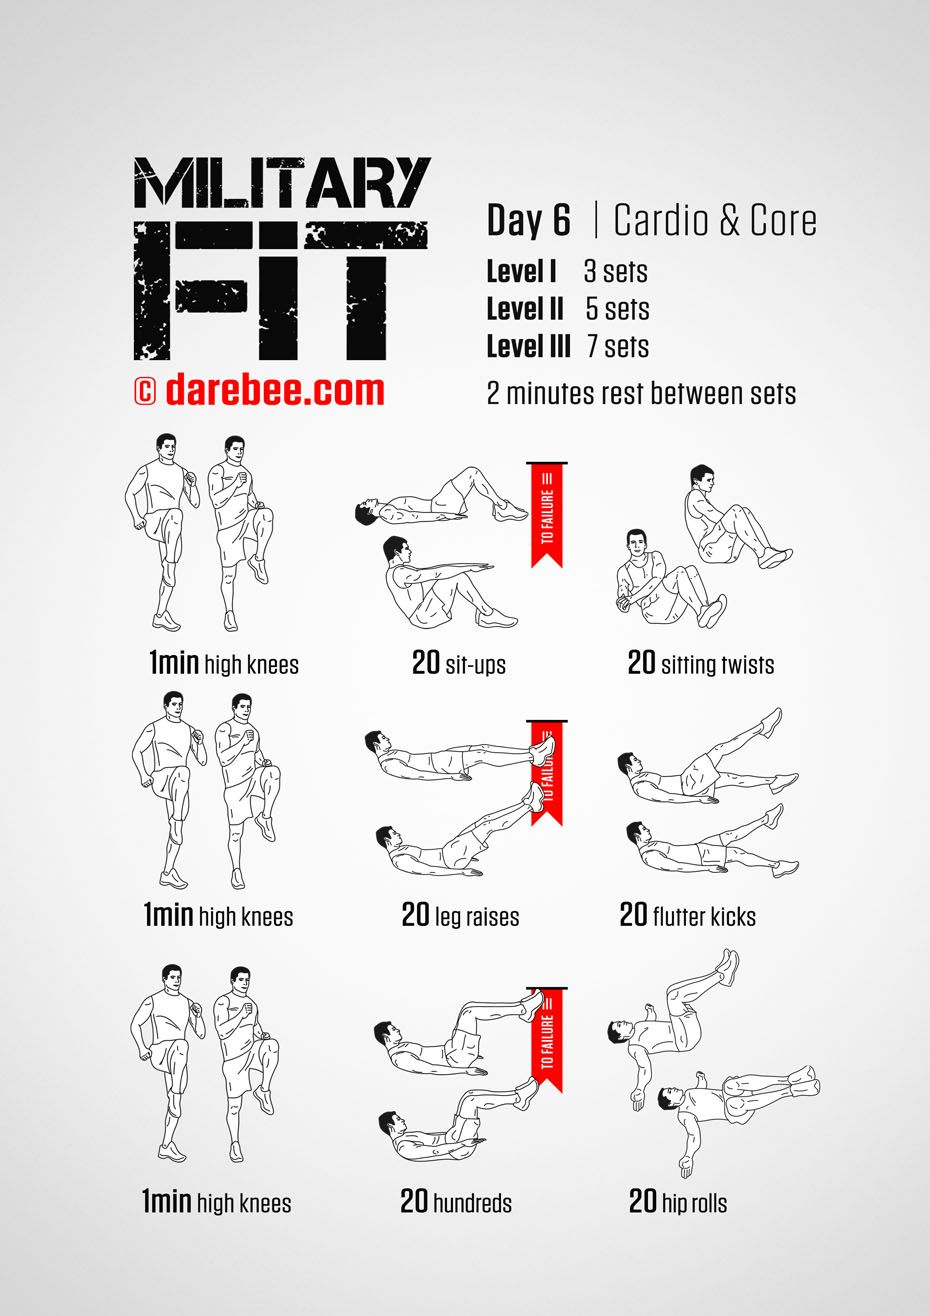 Military Fit: 30-Day Fitness Program | Diet/exercise | Pinterest ...